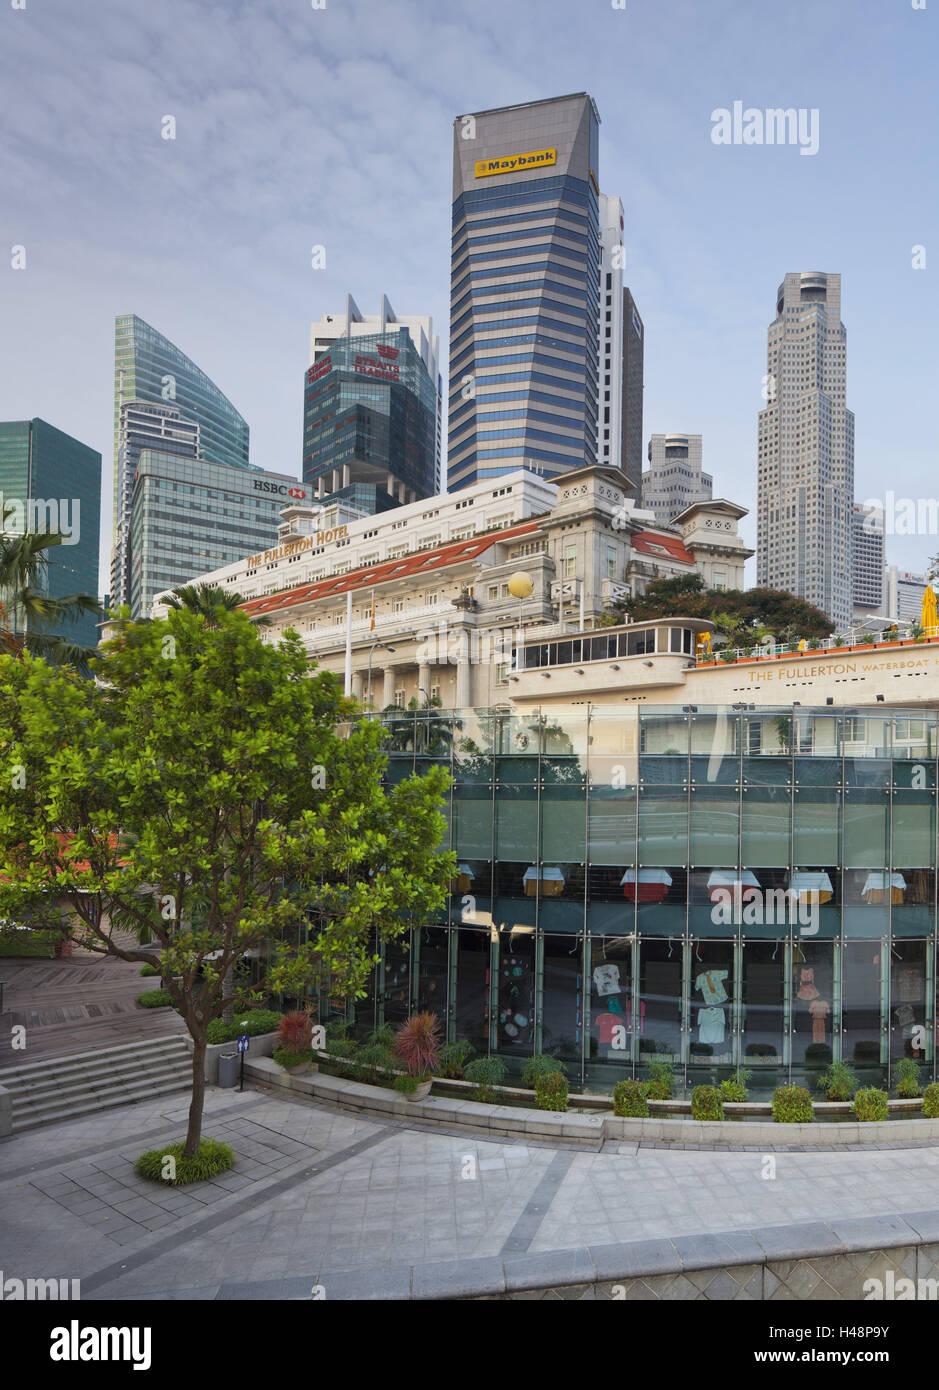 Fullerton hotel, Financial District, Marina Bay, Singapore, - Stock Image